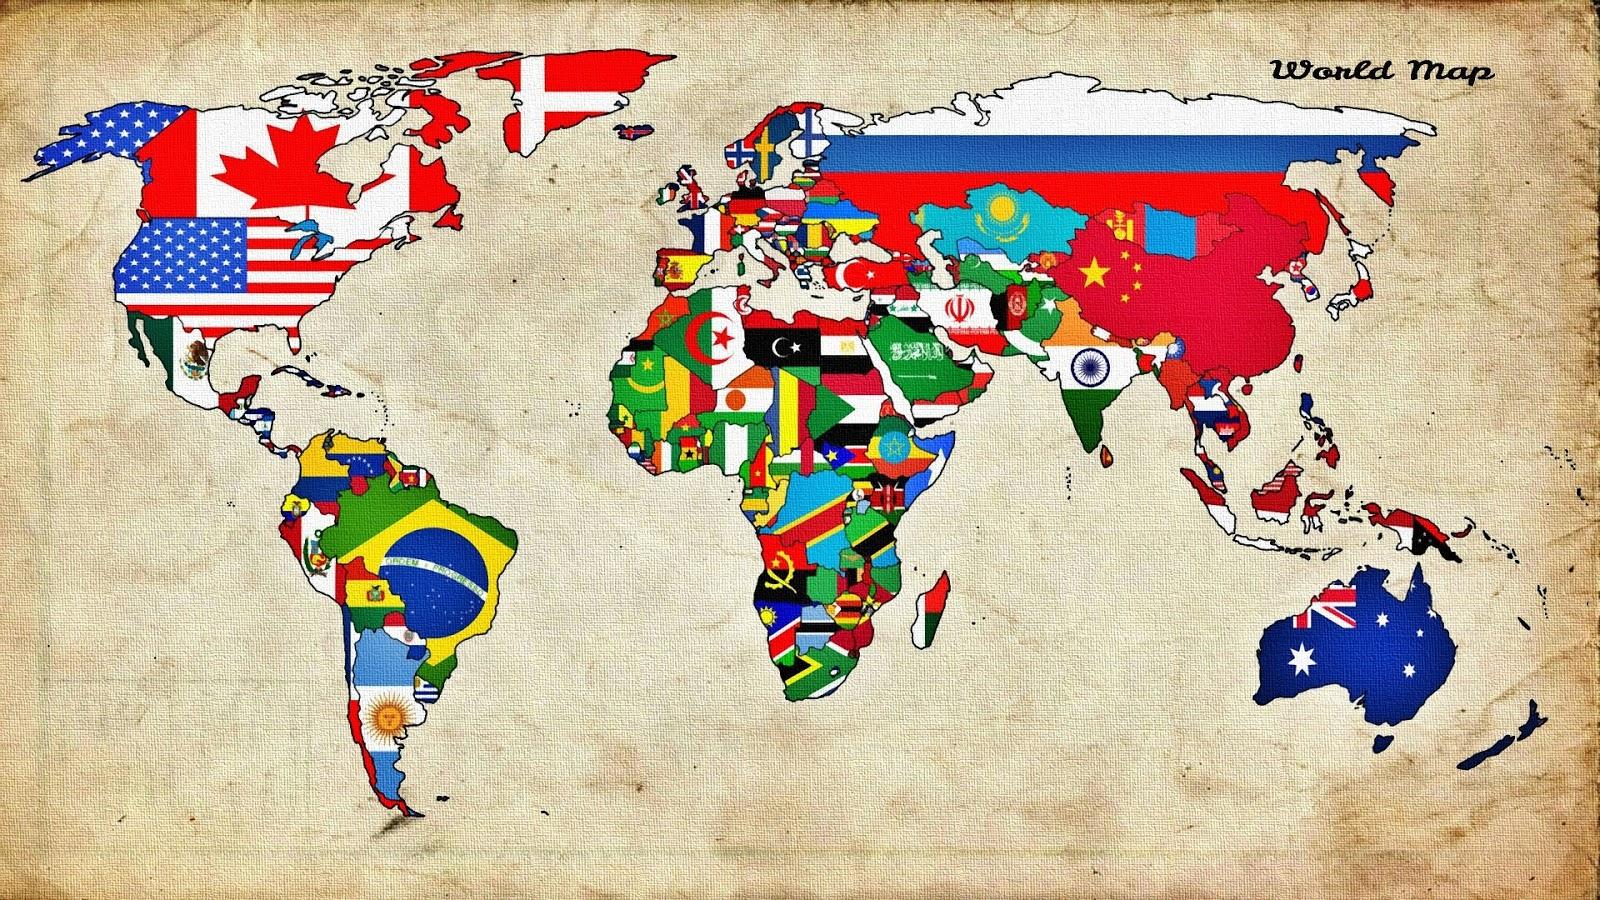 IPTV WORLD CHANNELS M3u8/M3u List UPDATE 21/07/2019 - FREE IPTV LINKS